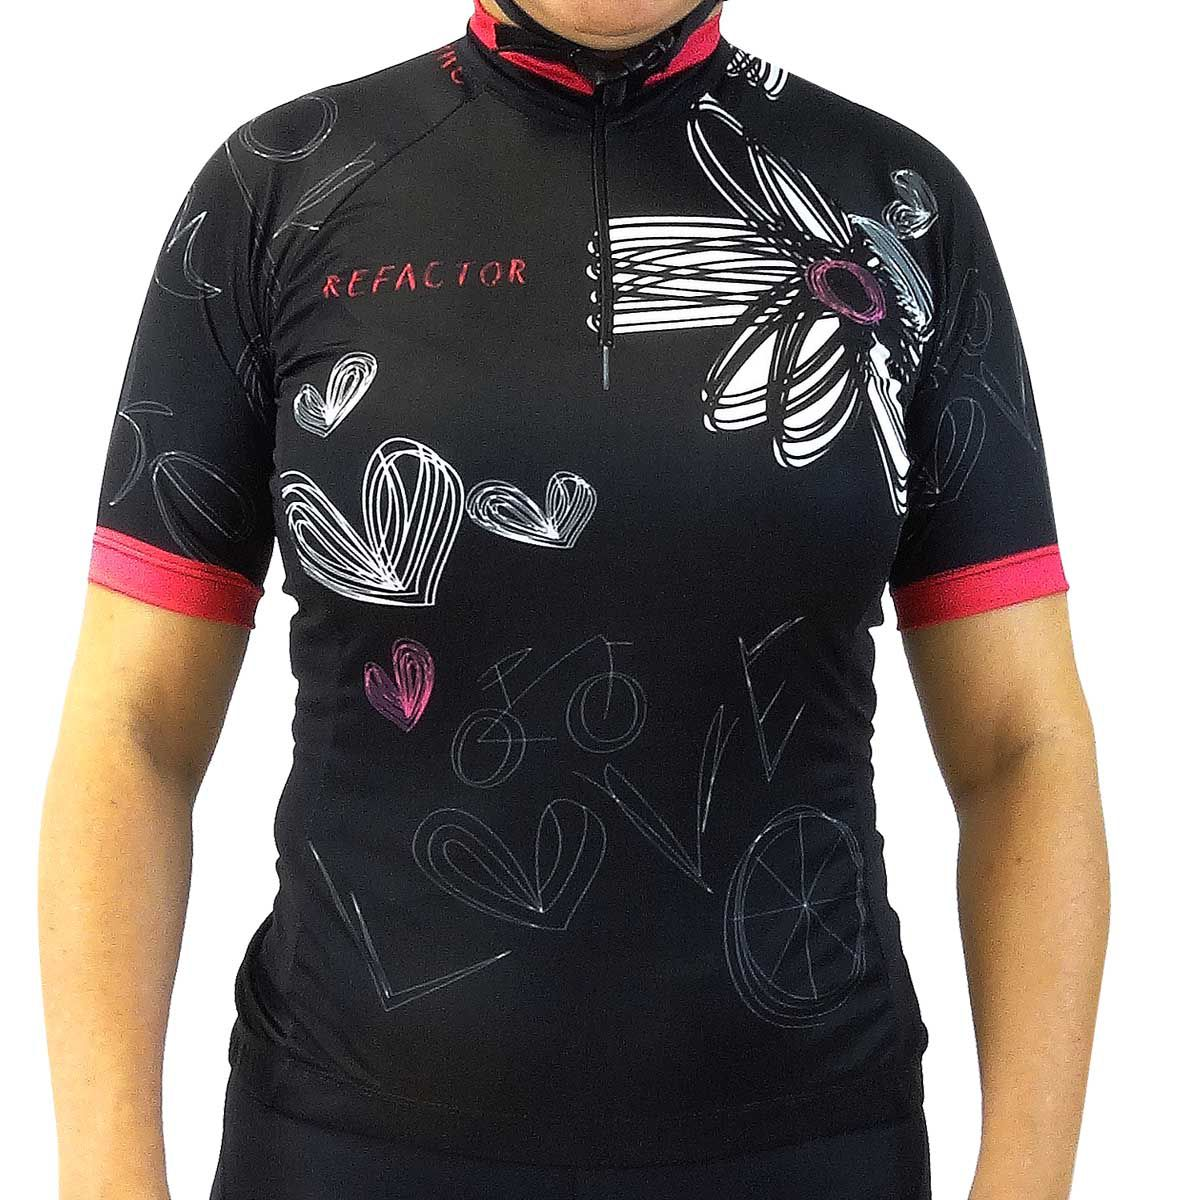 Camisa Blusa Ciclismo Feminina Refactor Love Bike Preta